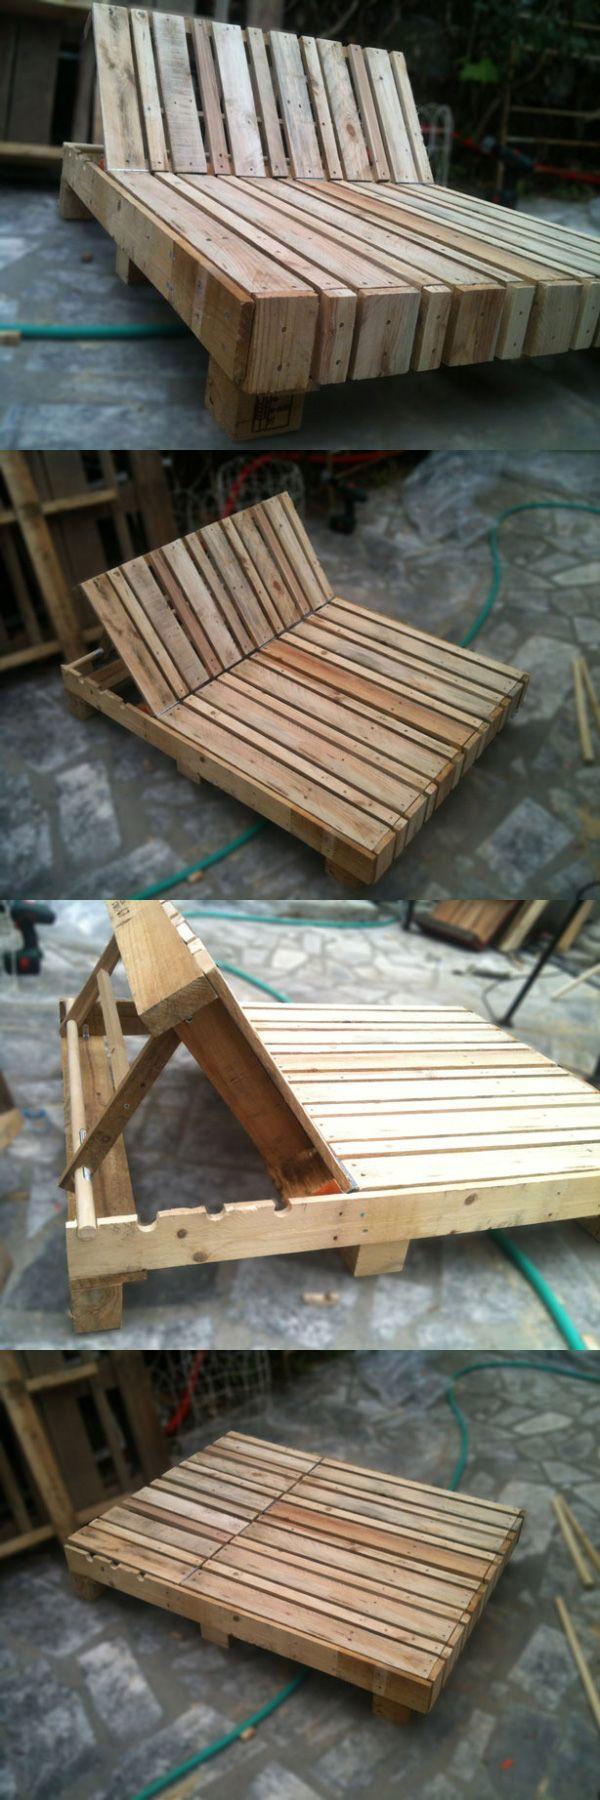 Поддон Lounge Chair .... был бы идеальным для задней палубе!